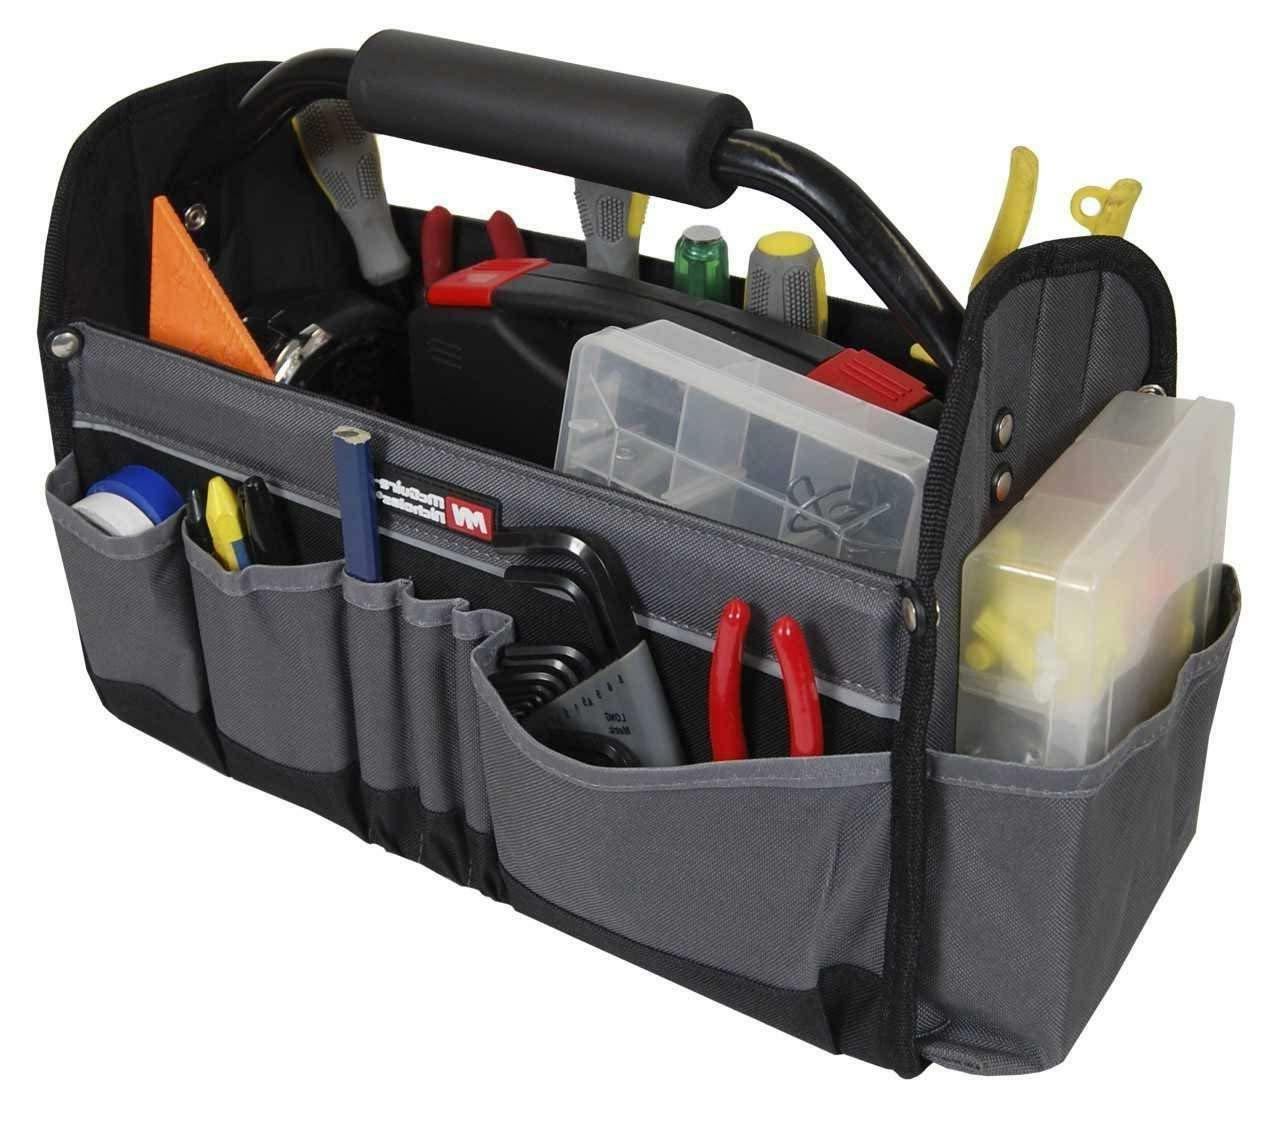 McGuire Nicholas Collapsible Tote Organizer Storage Tool Bag